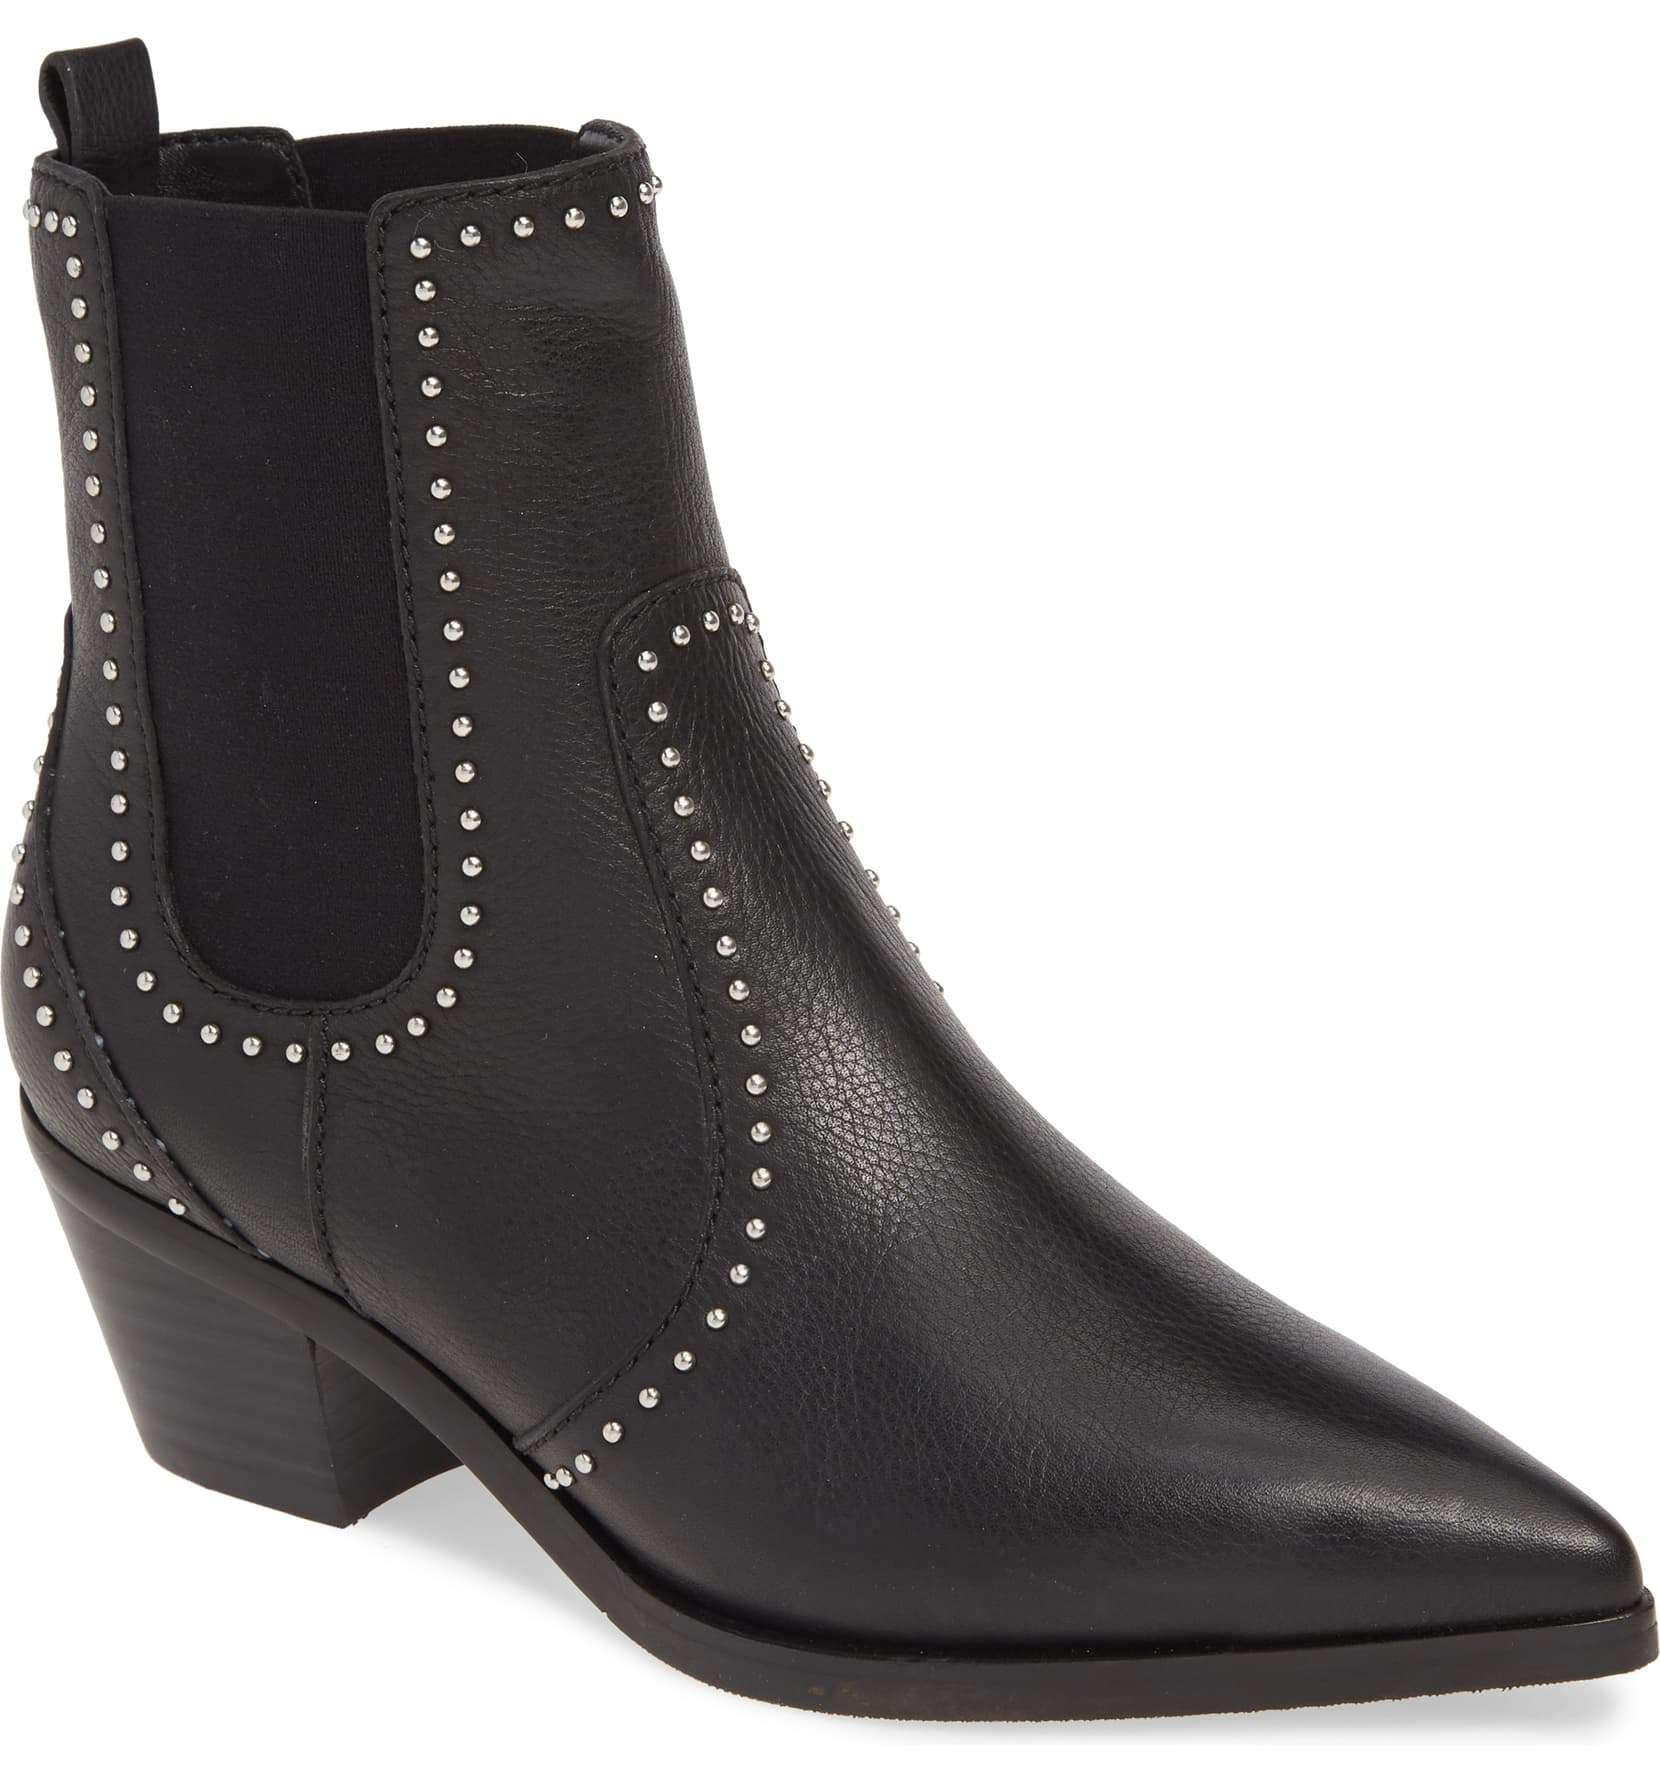 Willa Studded Chelsea Boot